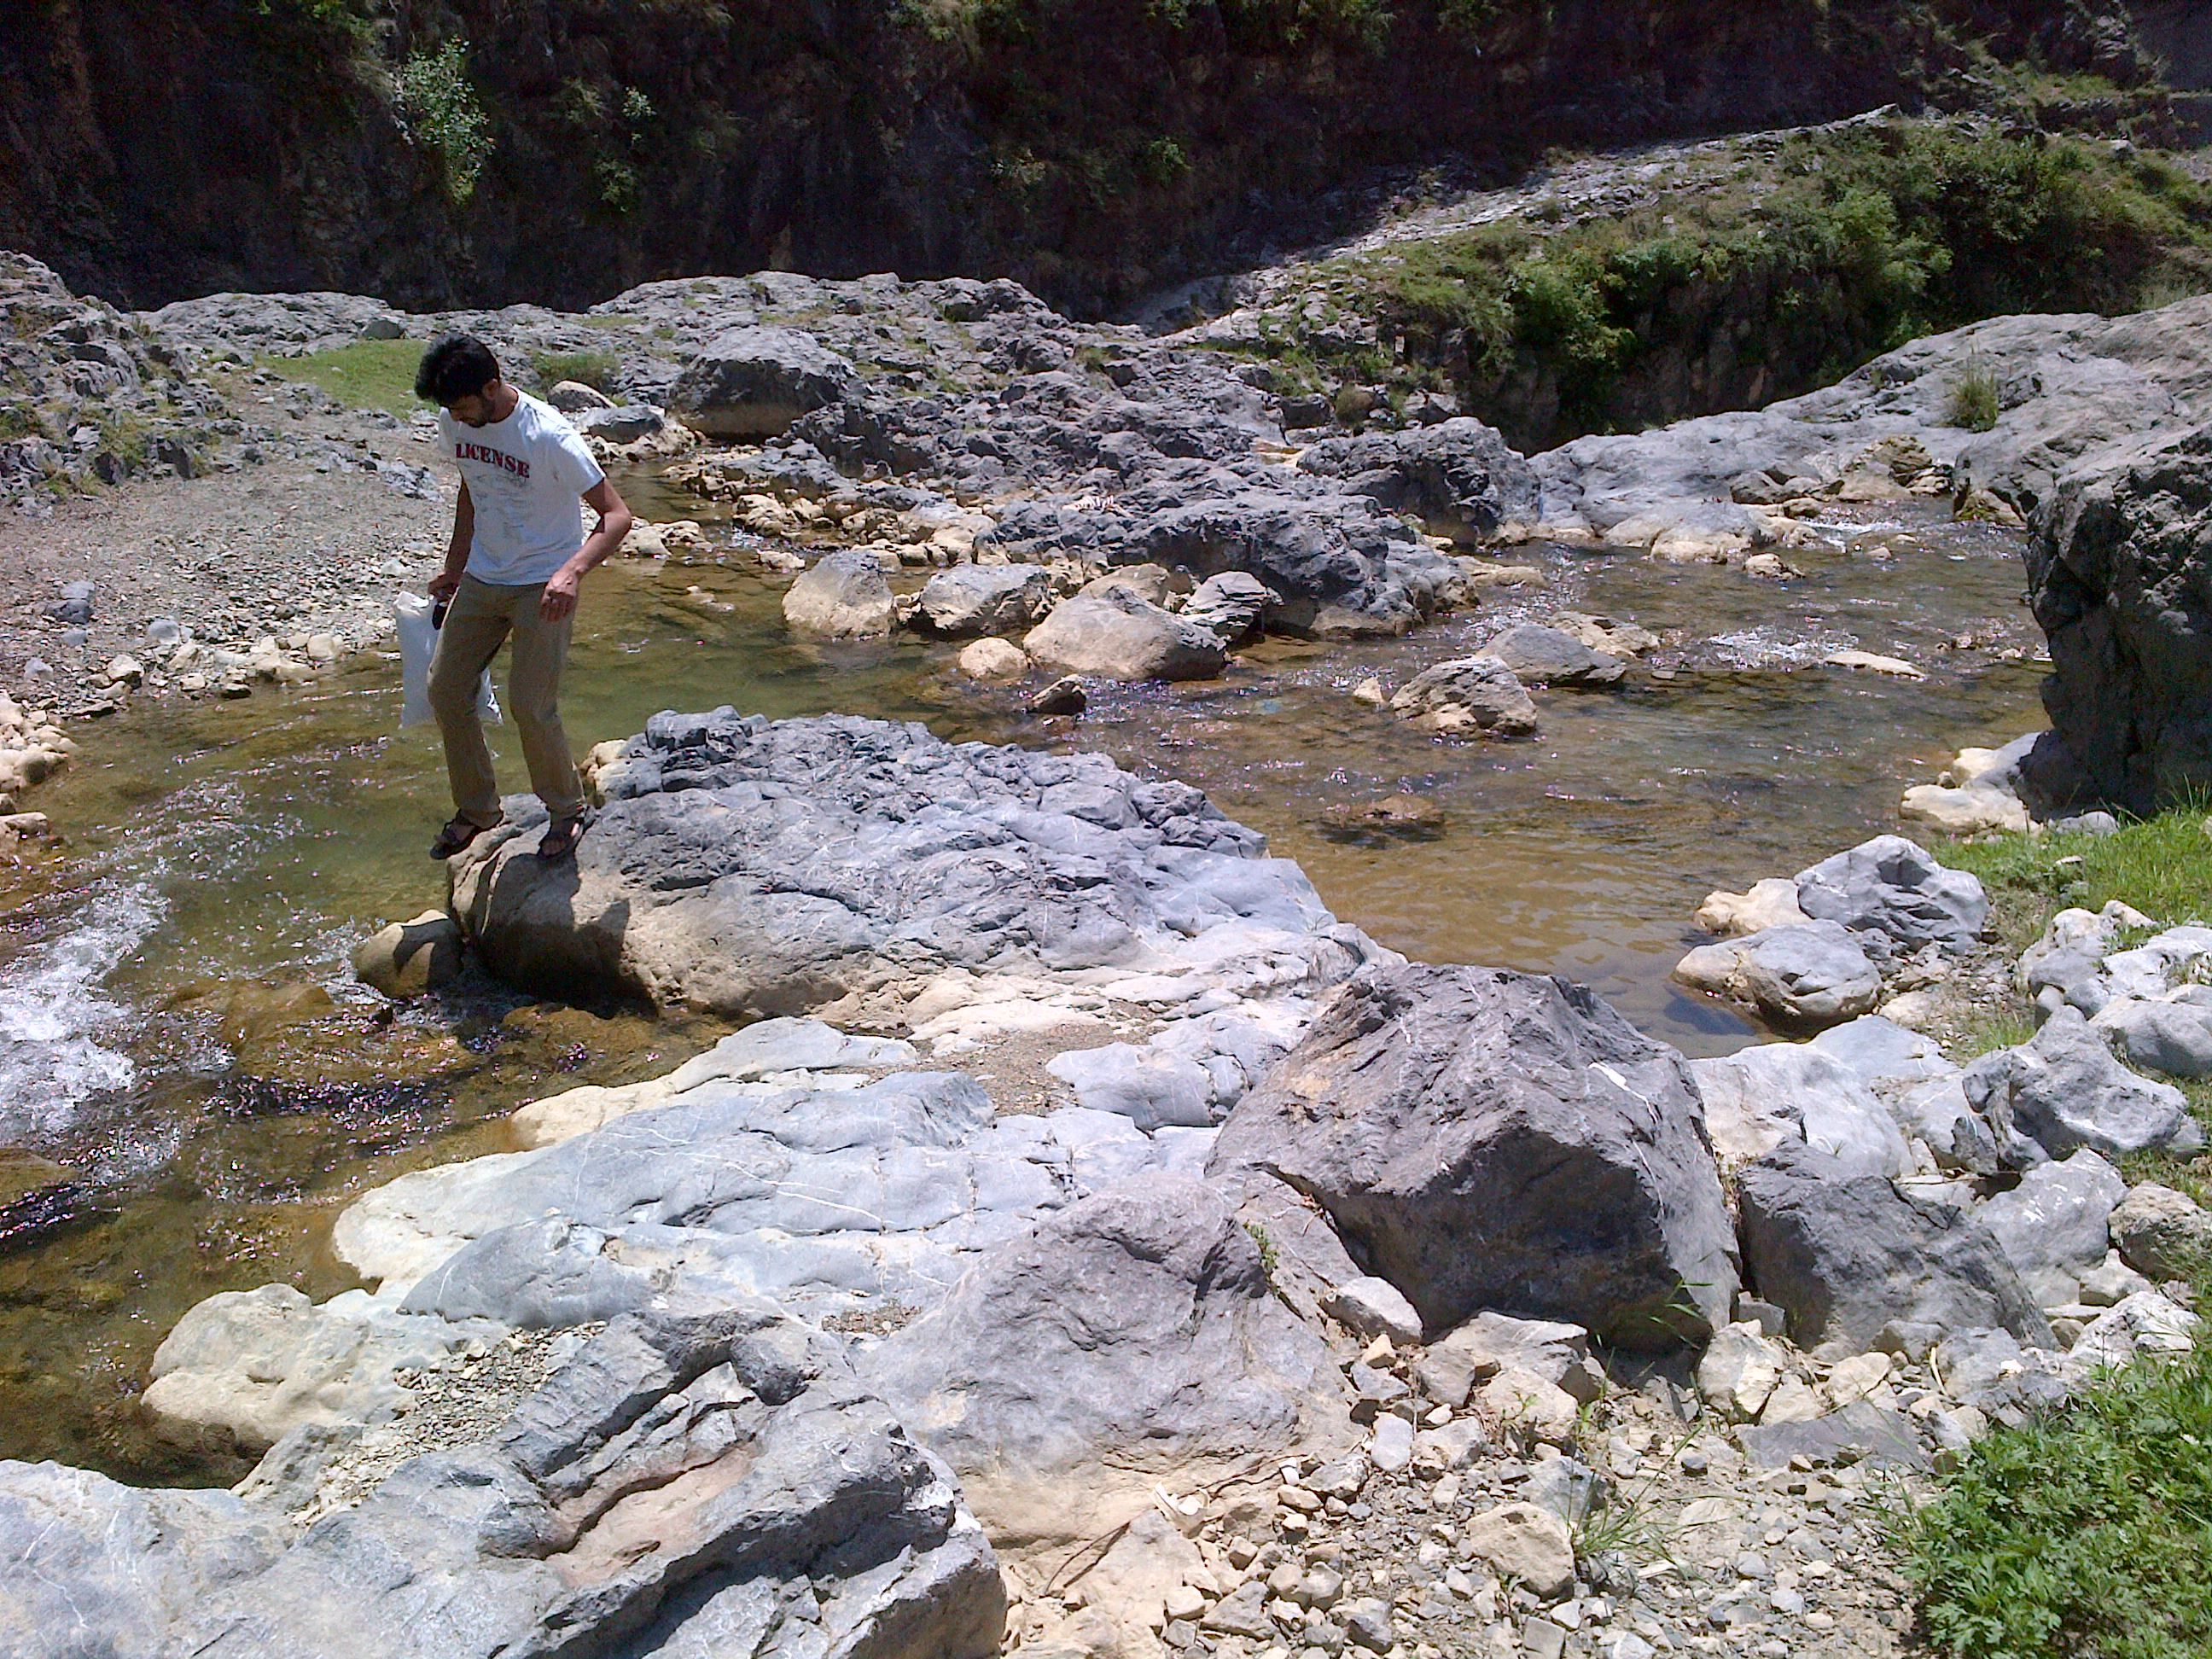 Rashid Minhas, negotiating the water inlet to waterfalls